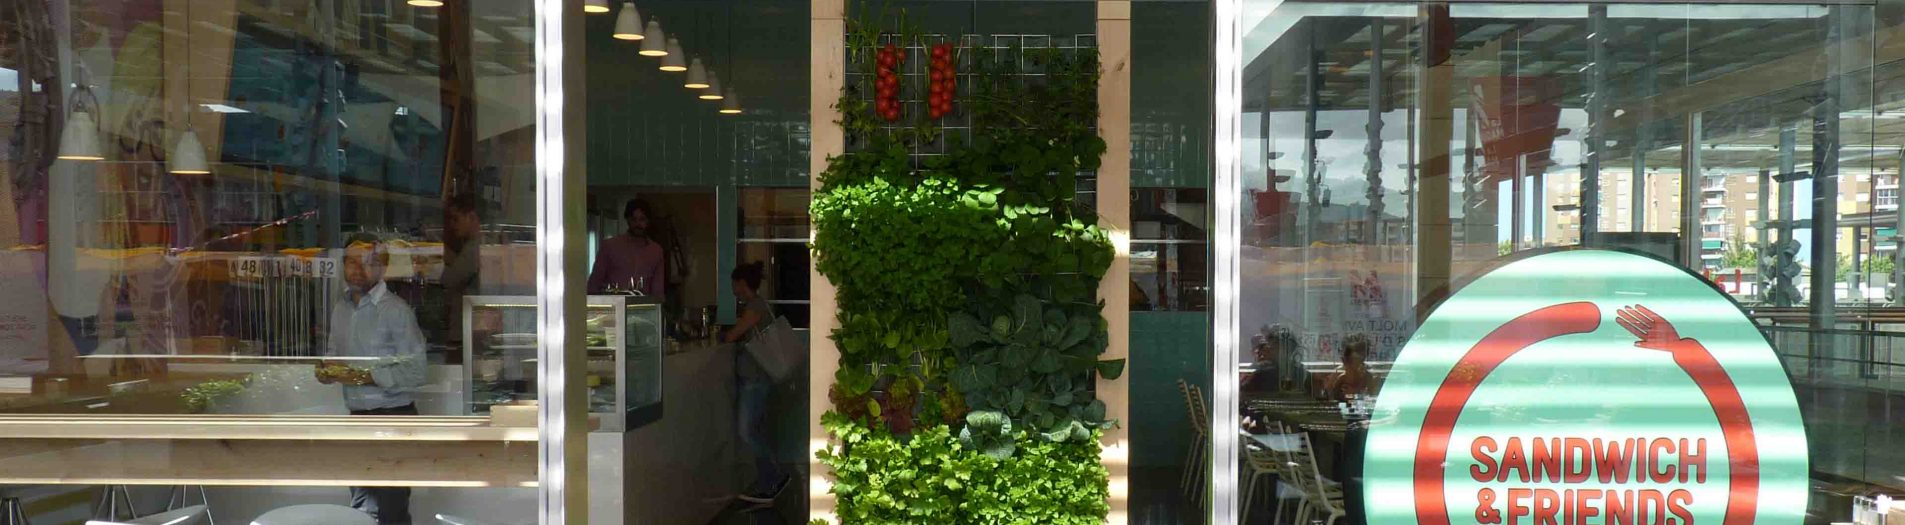 Huerto Vertical en restaurante en Barcelona